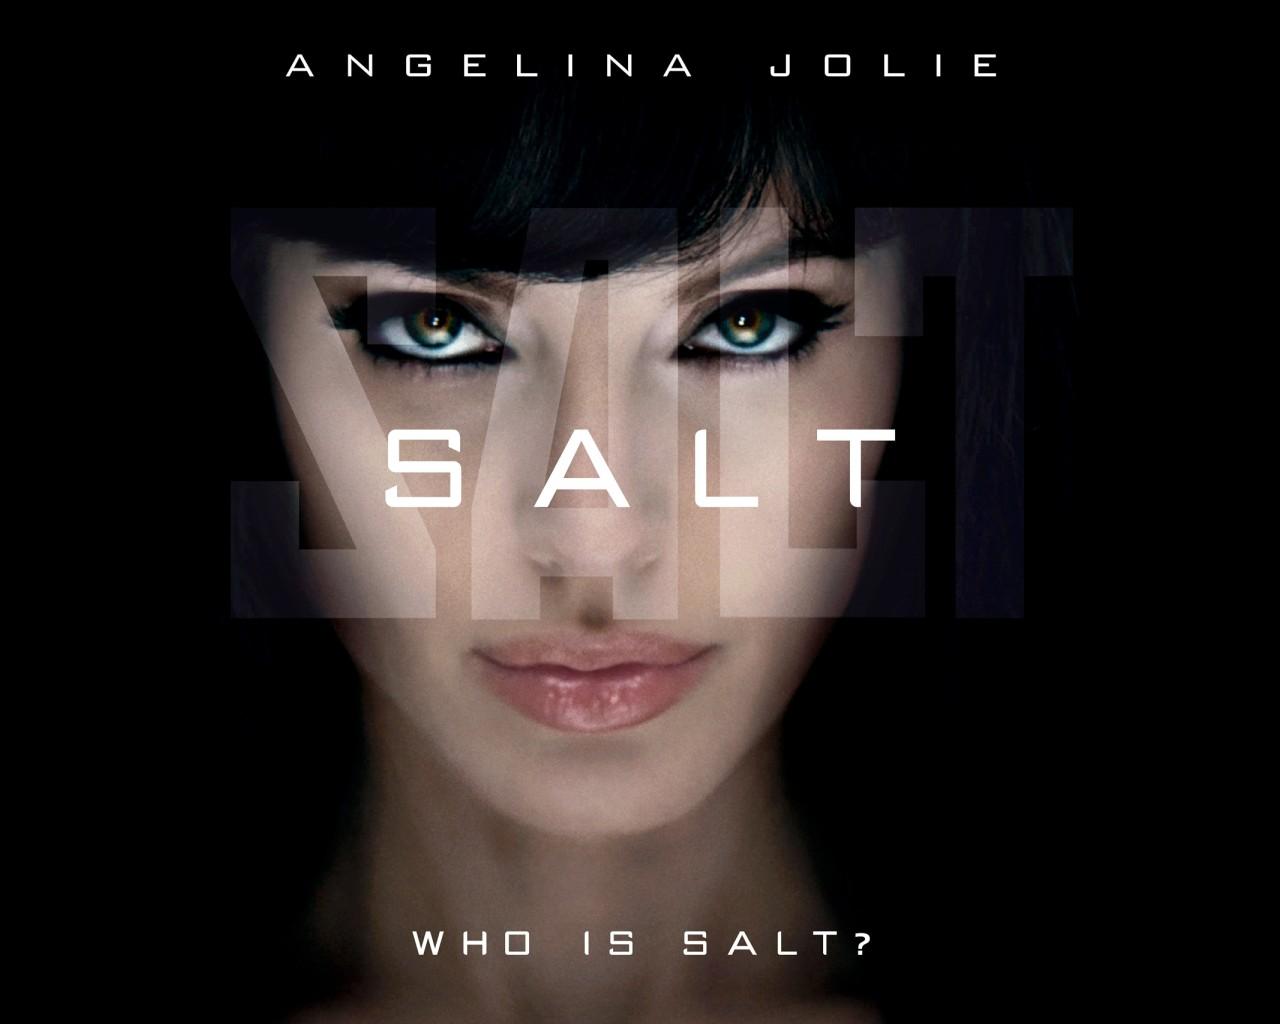 http://2.bp.blogspot.com/_wQ_rSruShhk/TFYgWBvVjsI/AAAAAAAAG38/rt_iFsIYh0U/s1600/Salt_Movie_2009_12882.jpg